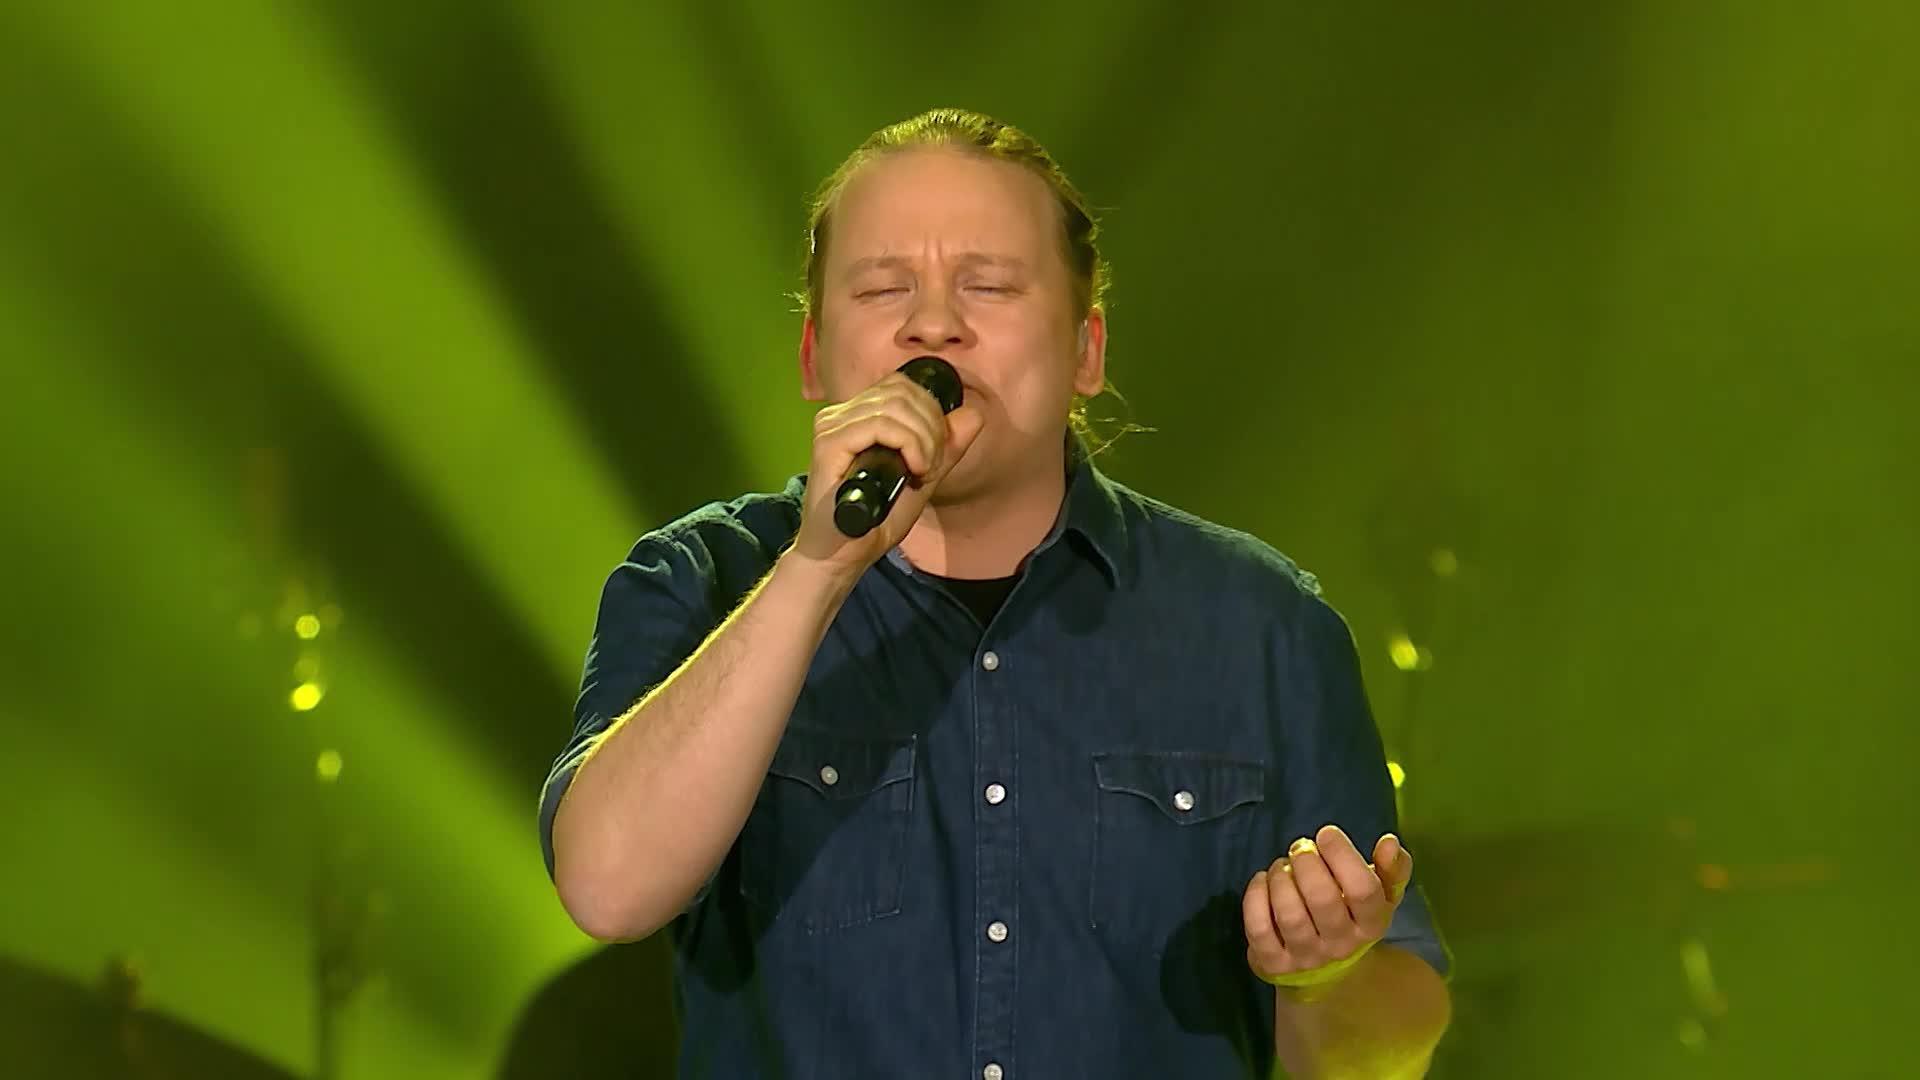 Antti Rask